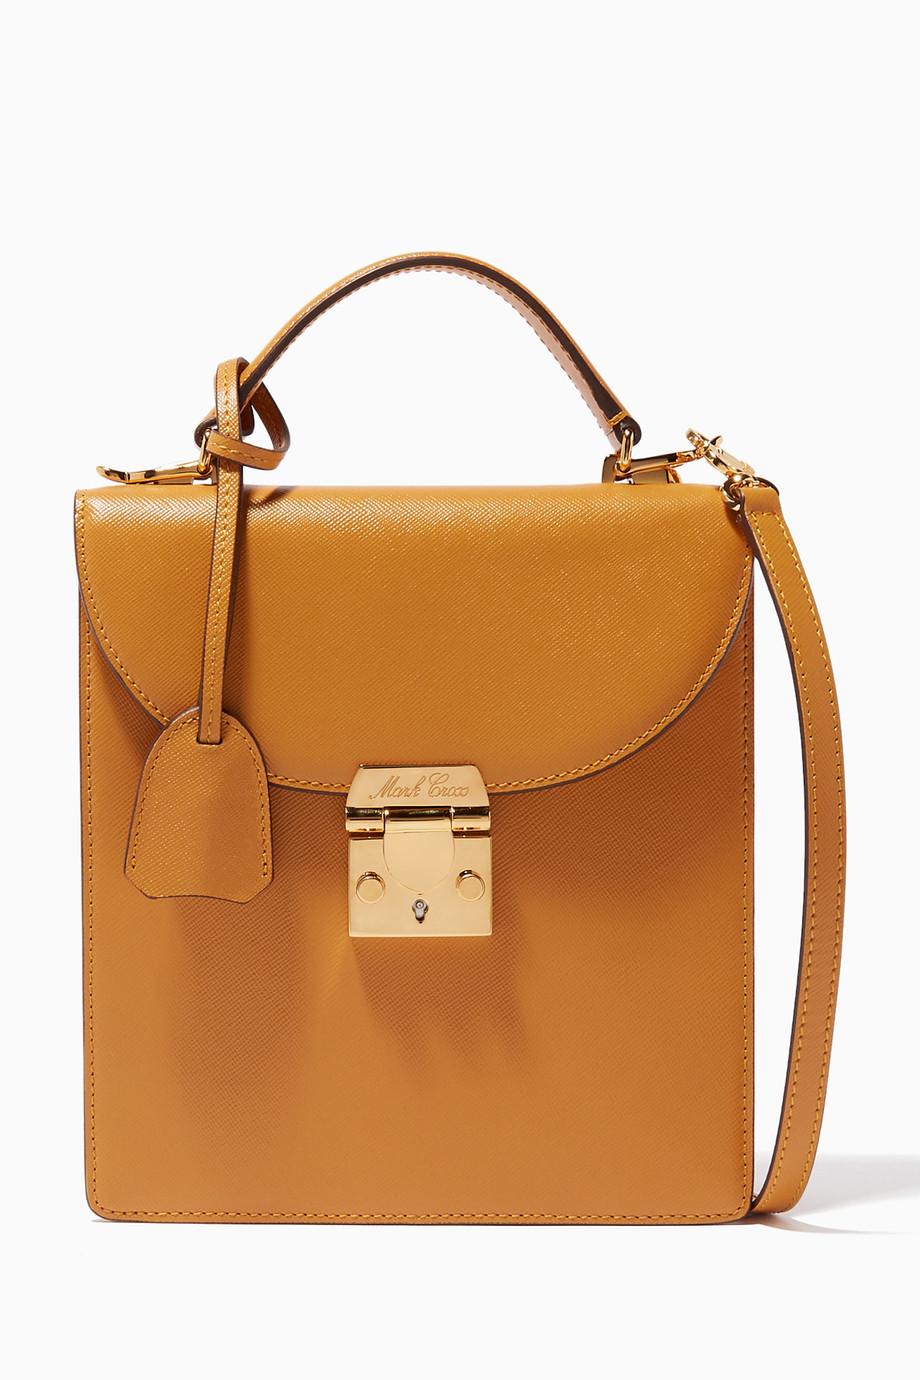 c83d0f77b0c425 Shop Mark Cross Yellow Mustard-Yellow Uptown Top-Handle Bag for ...